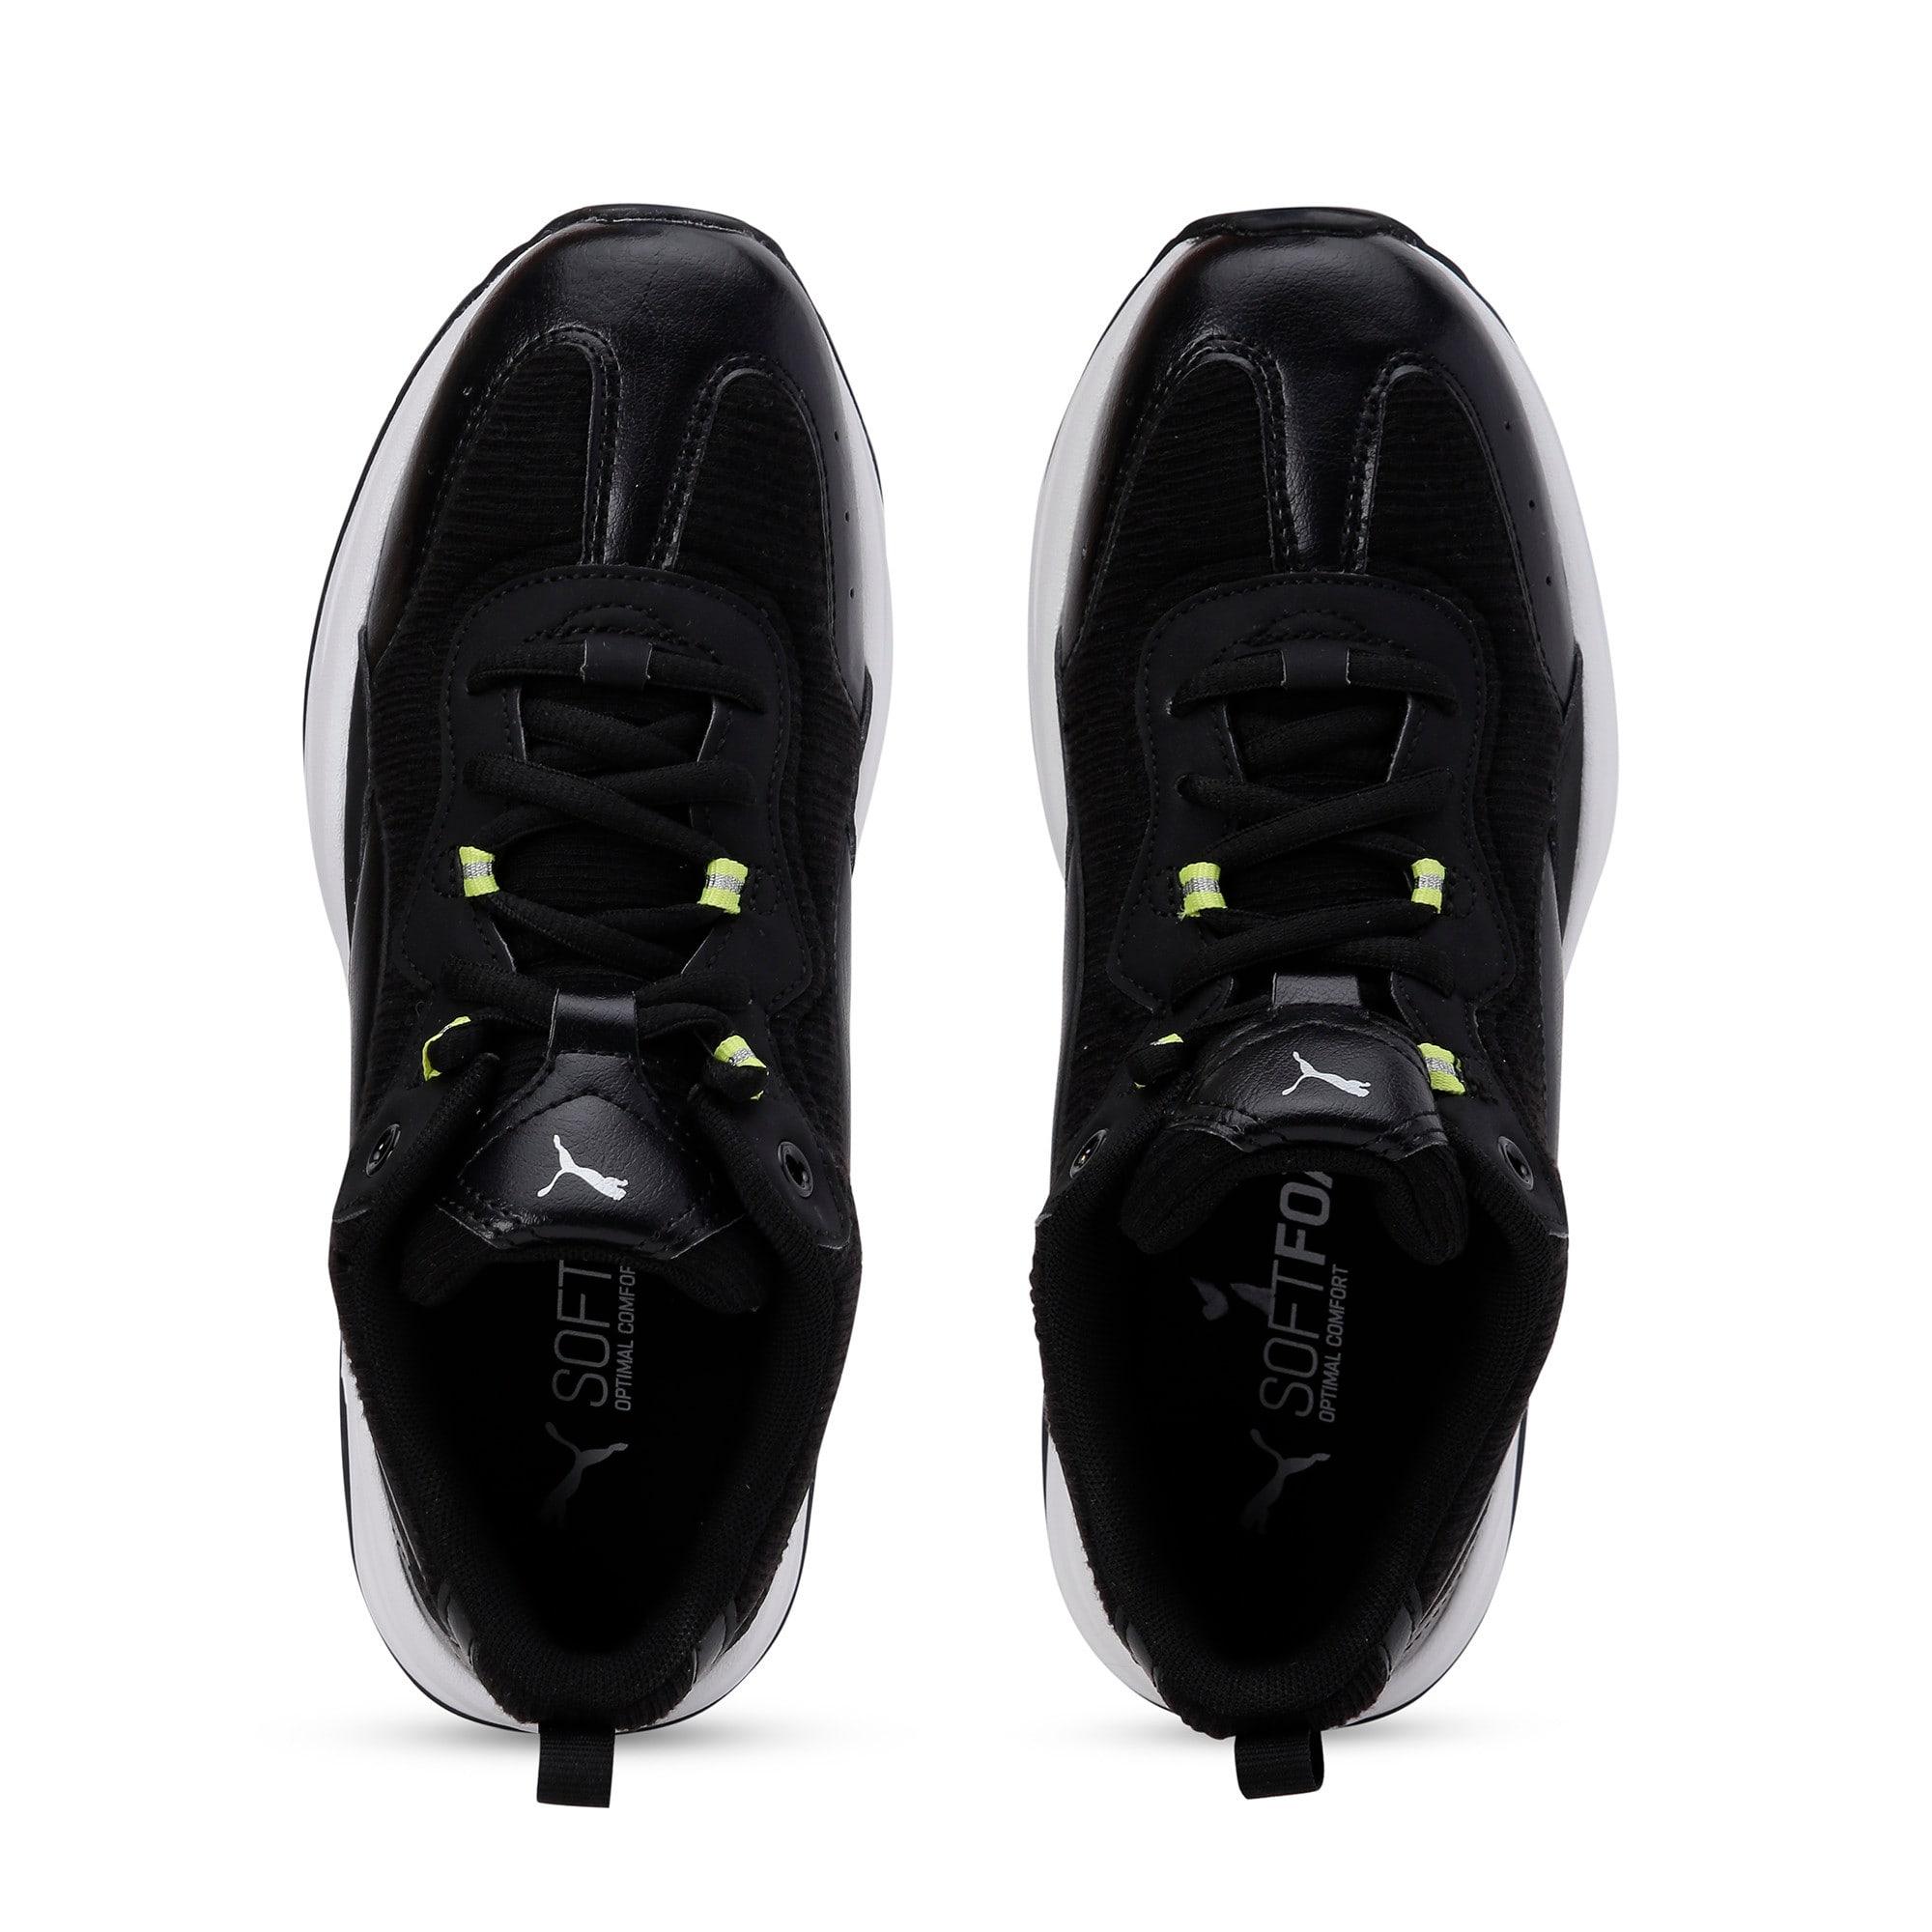 Thumbnail 8 of Cilia Shift Women's Training Shoes, Black-Nrgy Yellow-Silver-Wht, medium-IND